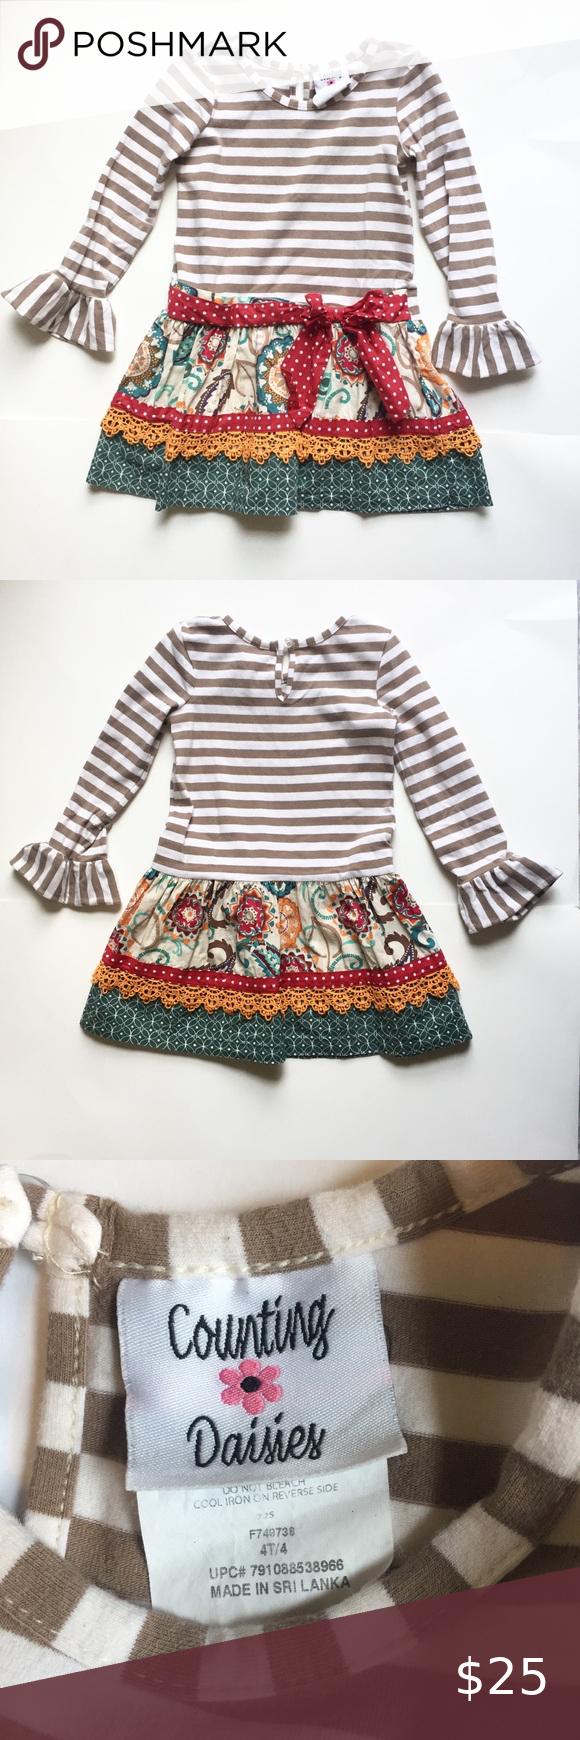 4t Girl Counting Daisies Long Sleeve Dress Long Sleeve Dress Long Sleeve Kids Dresses [ 1740 x 580 Pixel ]